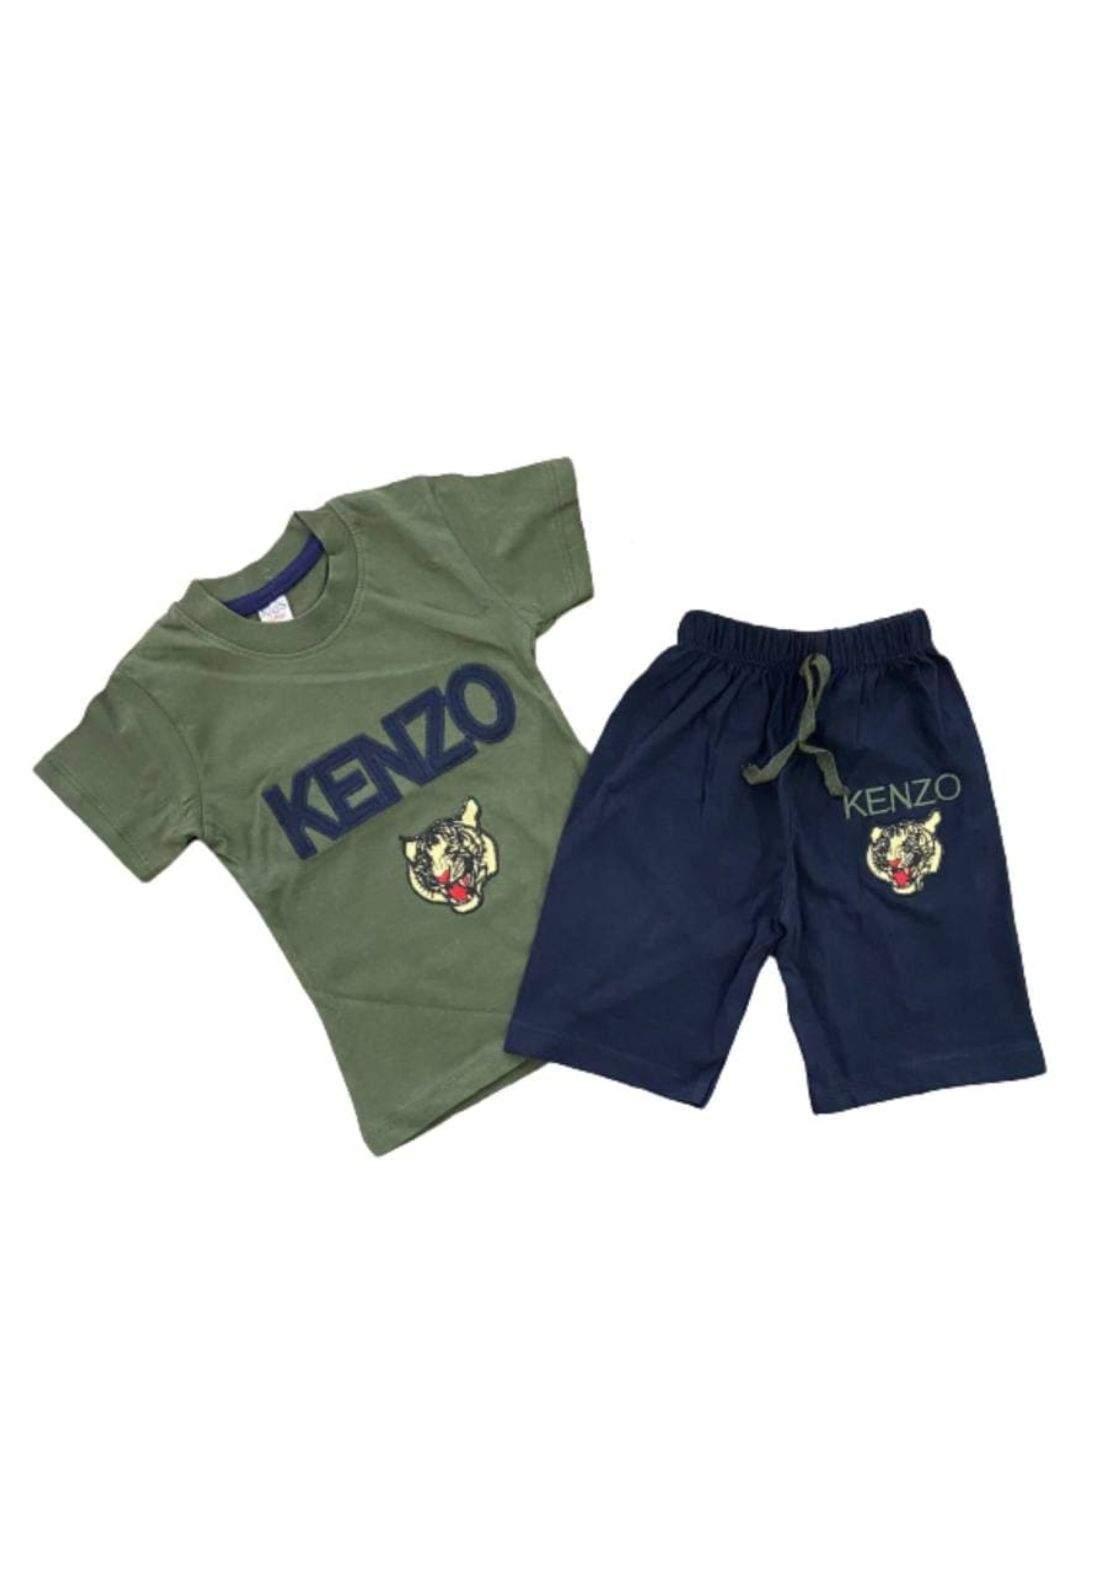 tracksuit for boys  olive (t-shirt+short) ( تراكسوت ولادي زيتوني  (شورت و تيشيرت